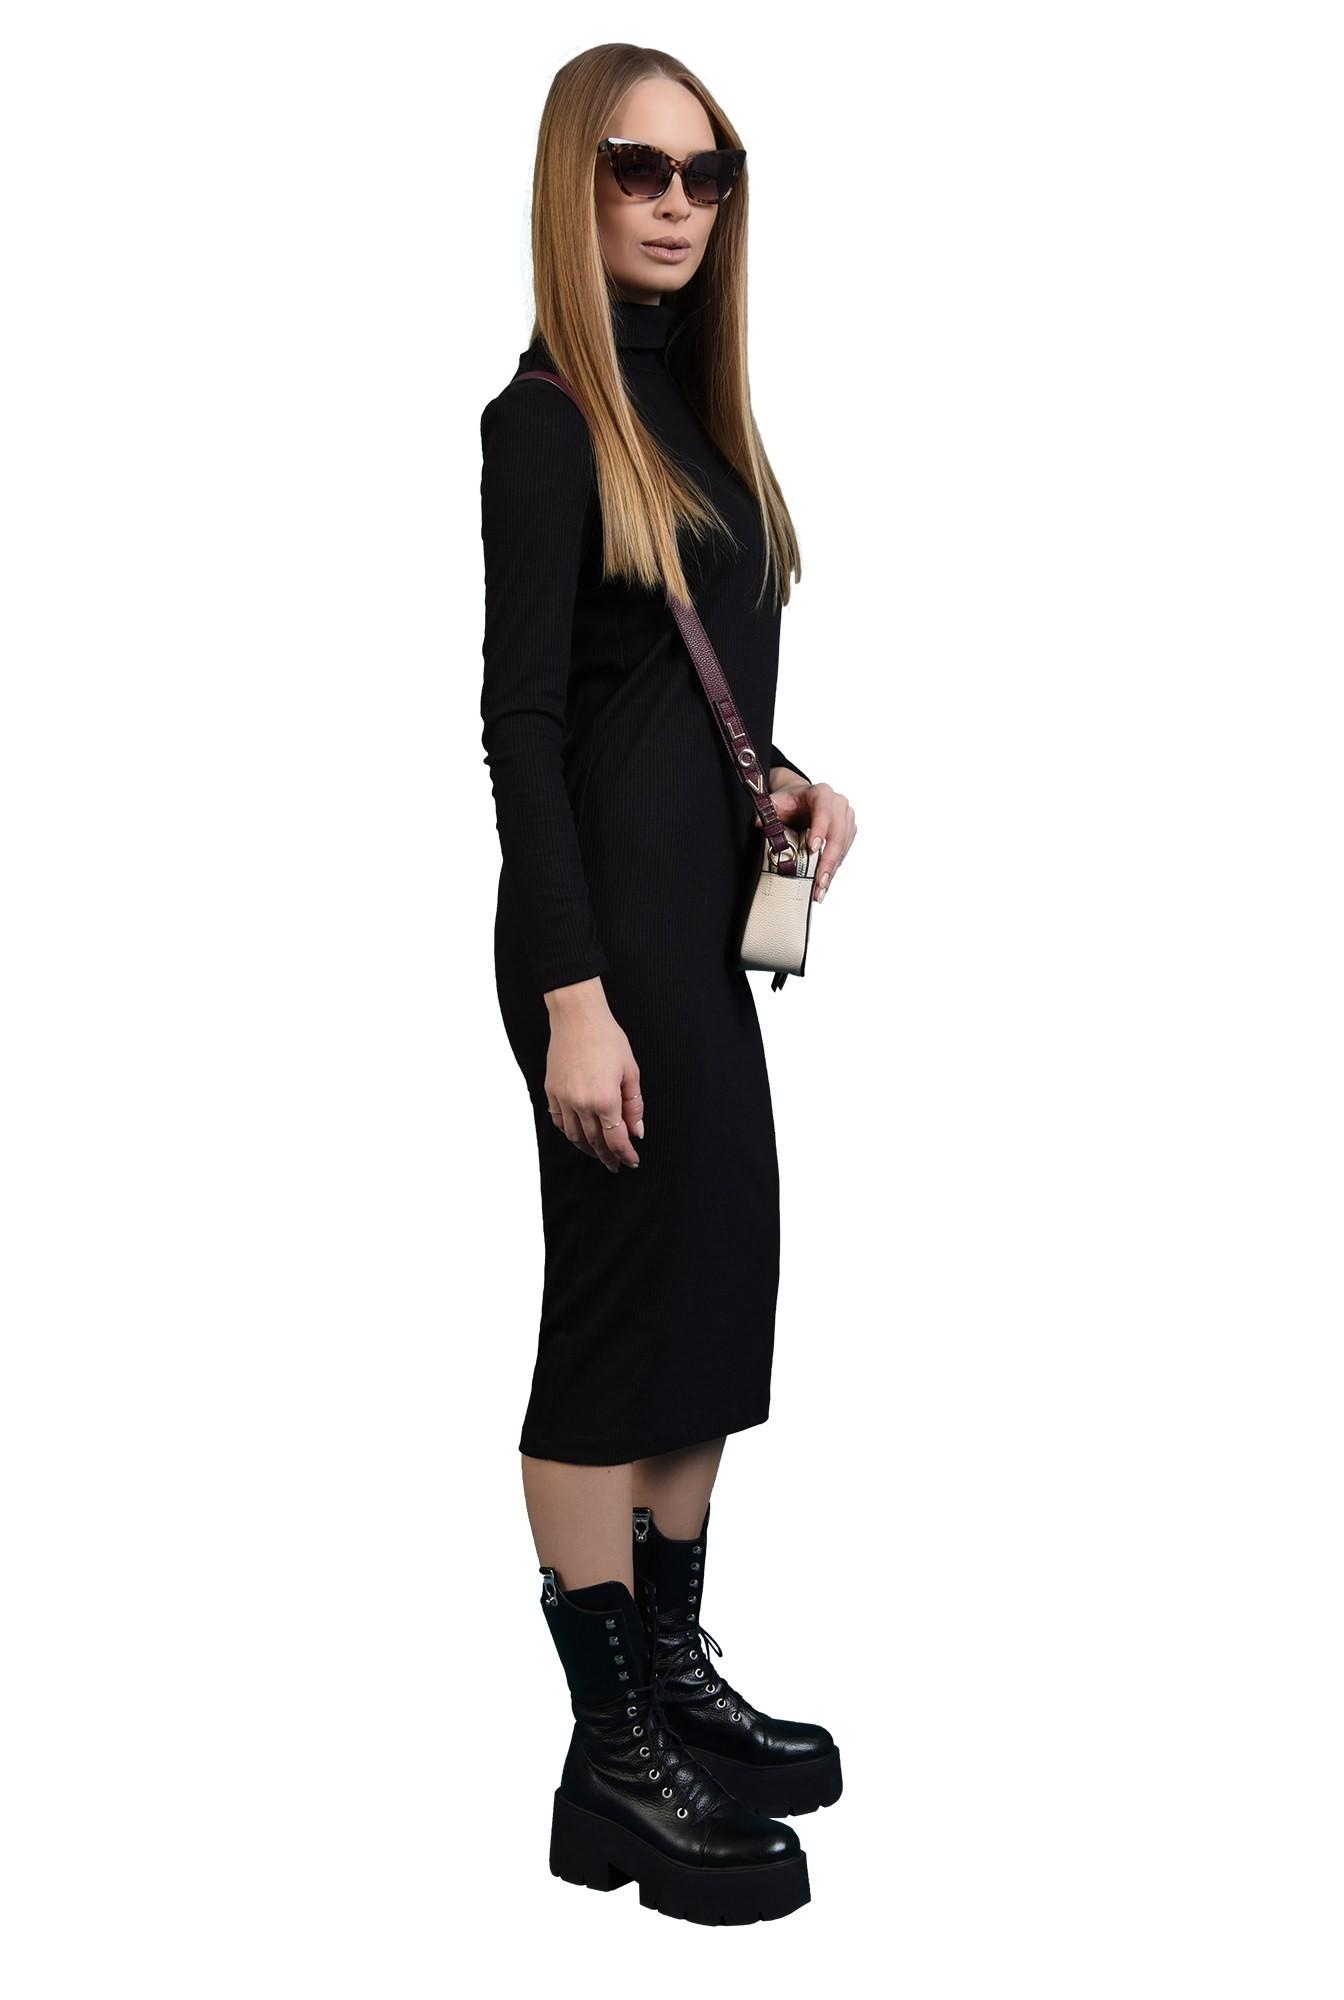 rochie midi, neagra, tricotata, cu maneca lunga